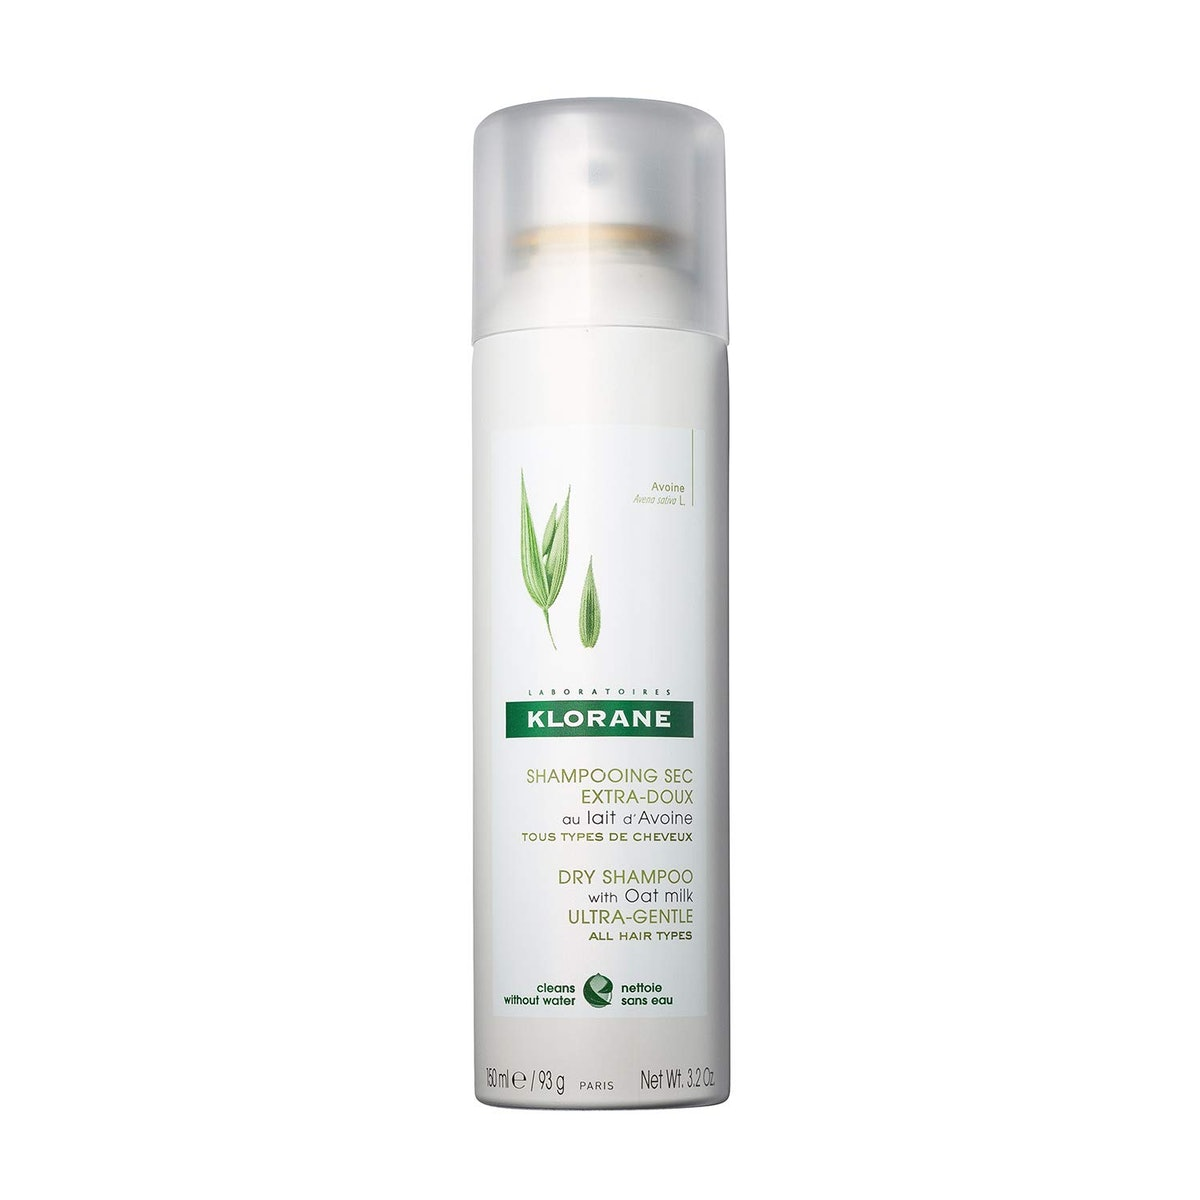 Klorane Dry Shampoo With Oat Milk (3.2 Ounces)